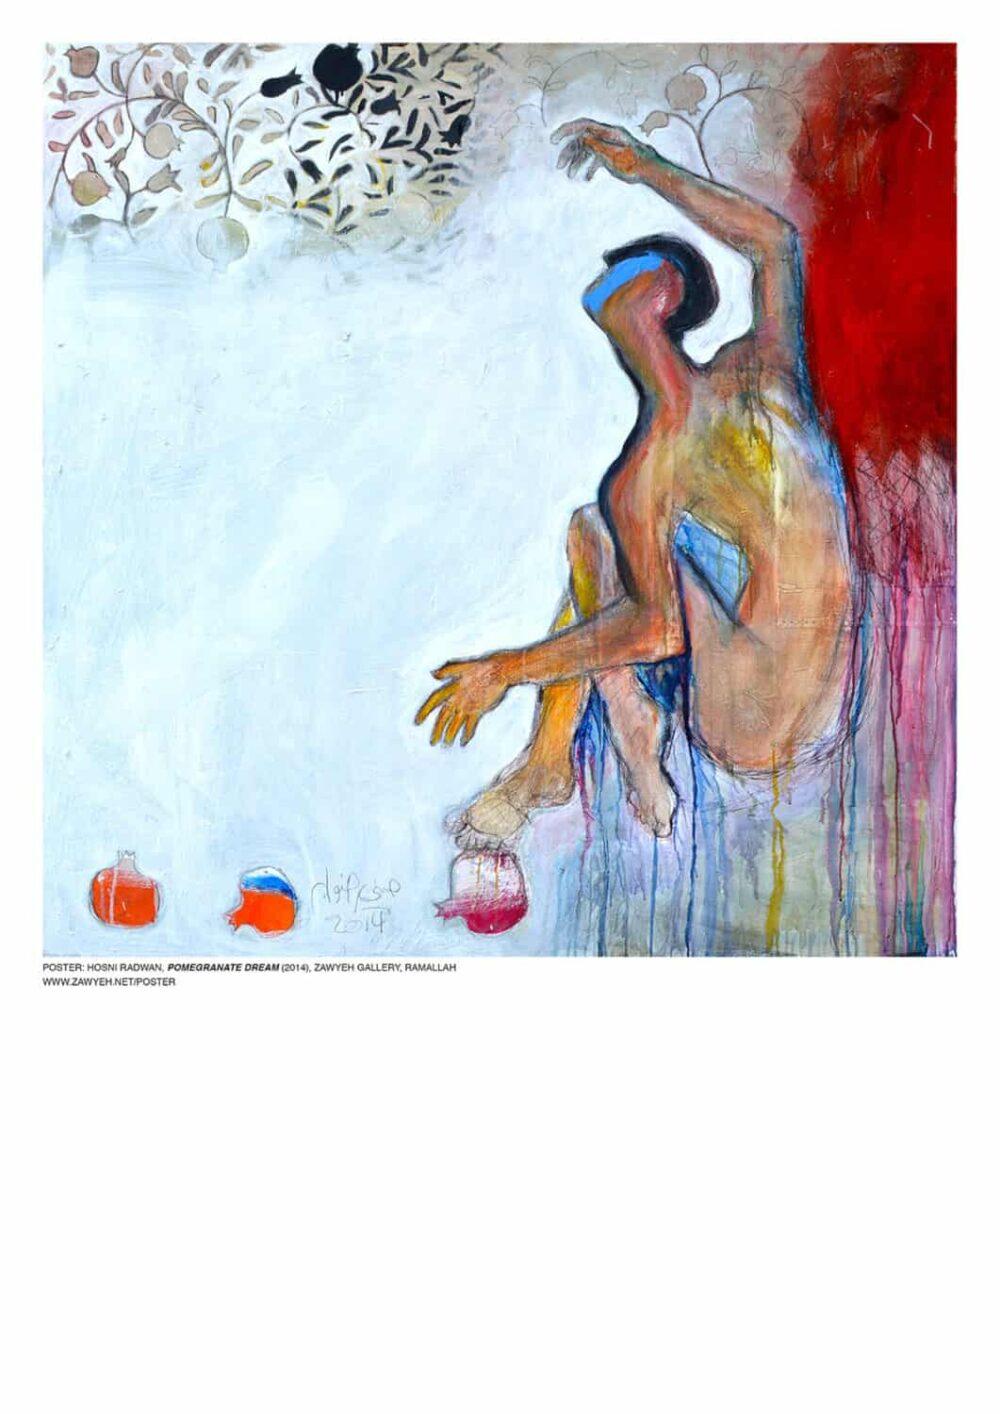 Pomegranate Dream by Hosni Radwan